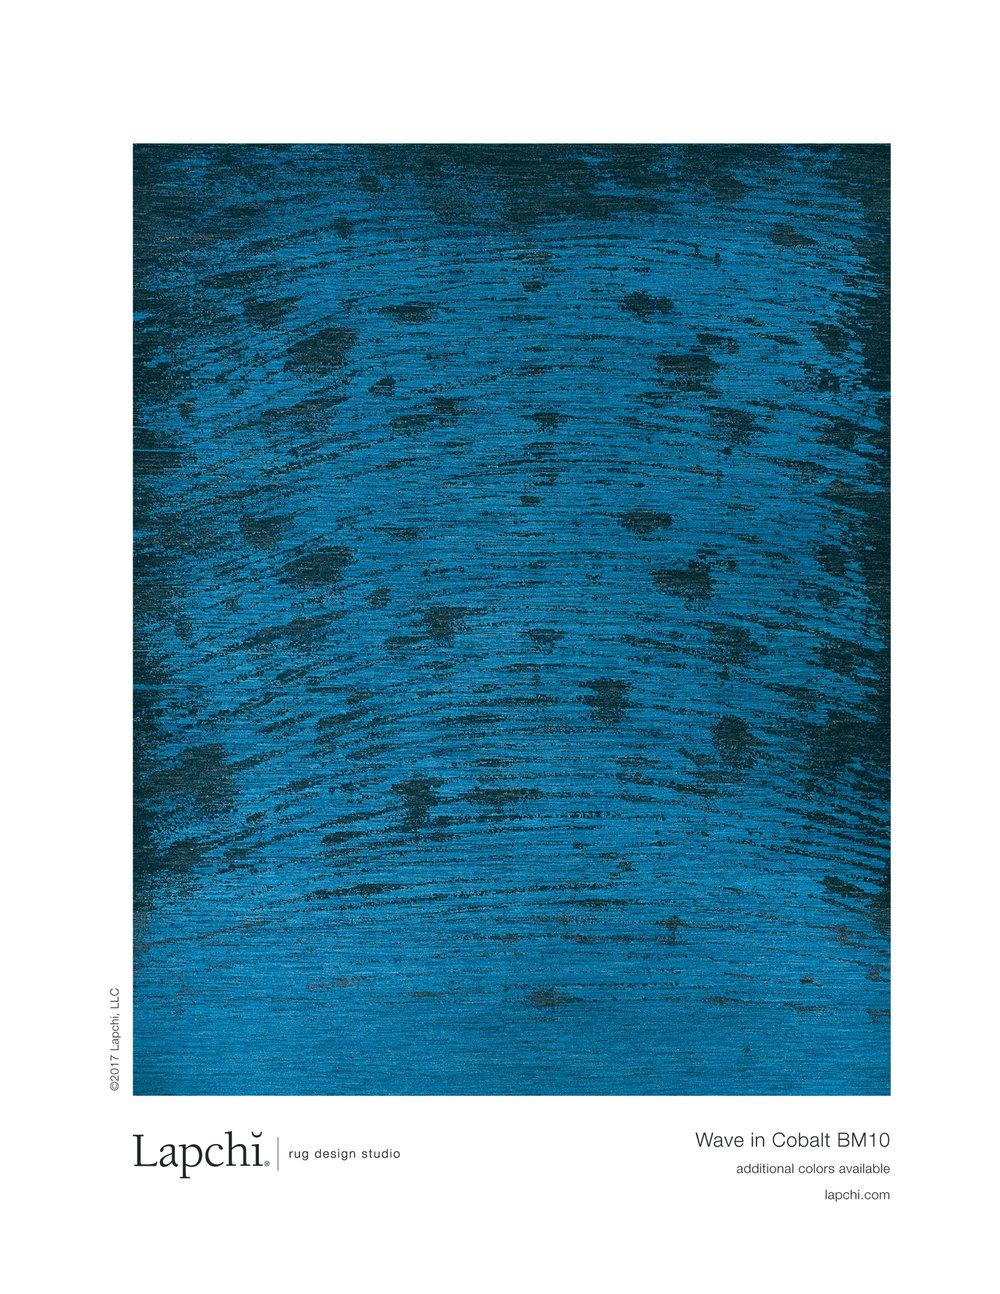 Wave area rug in cobalt from Lapchi rug design studio.